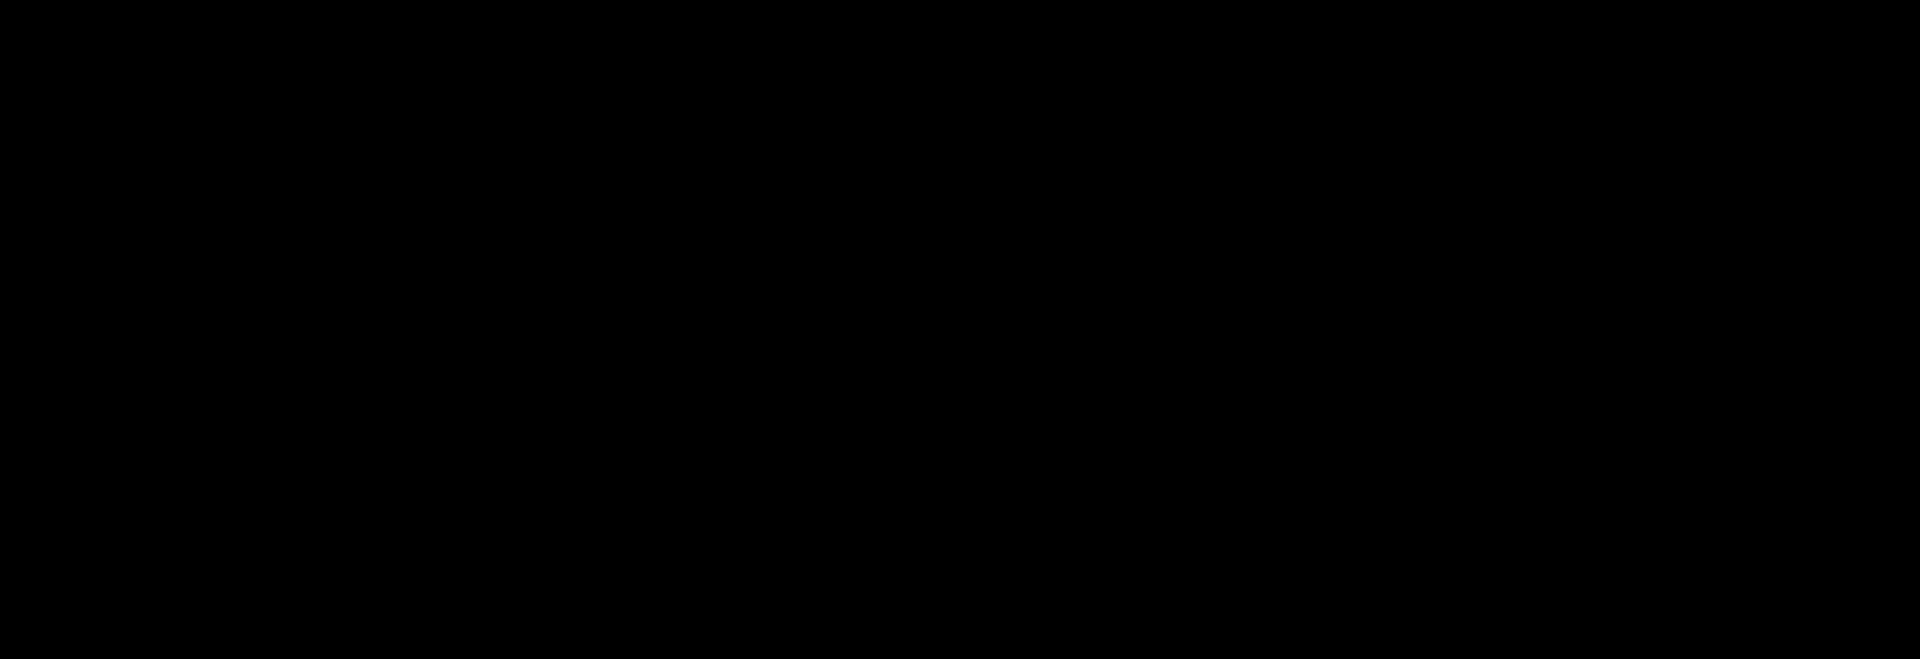 techno-tan1920x659